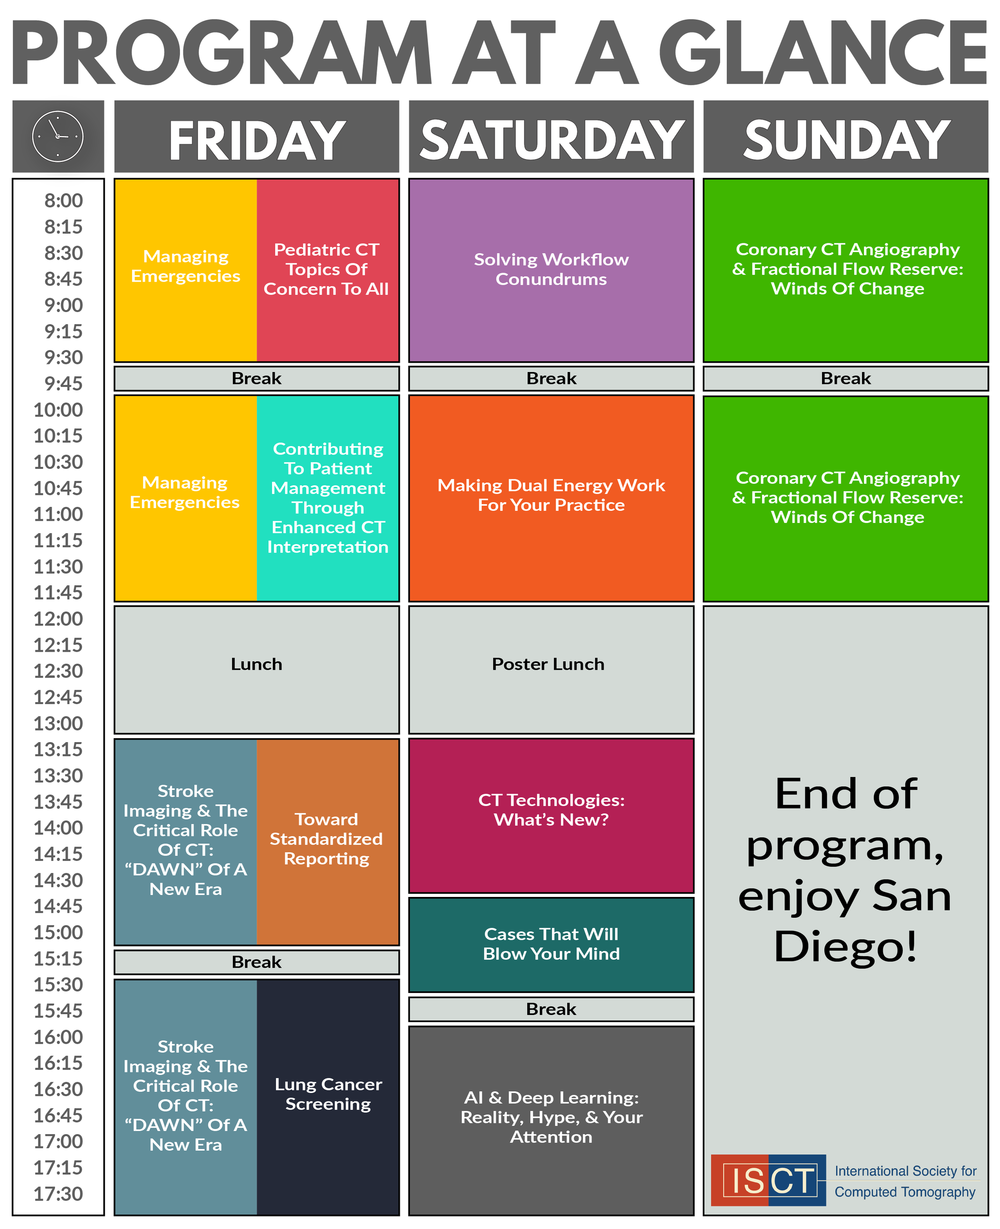 ISCT 2018 Program At A Glance